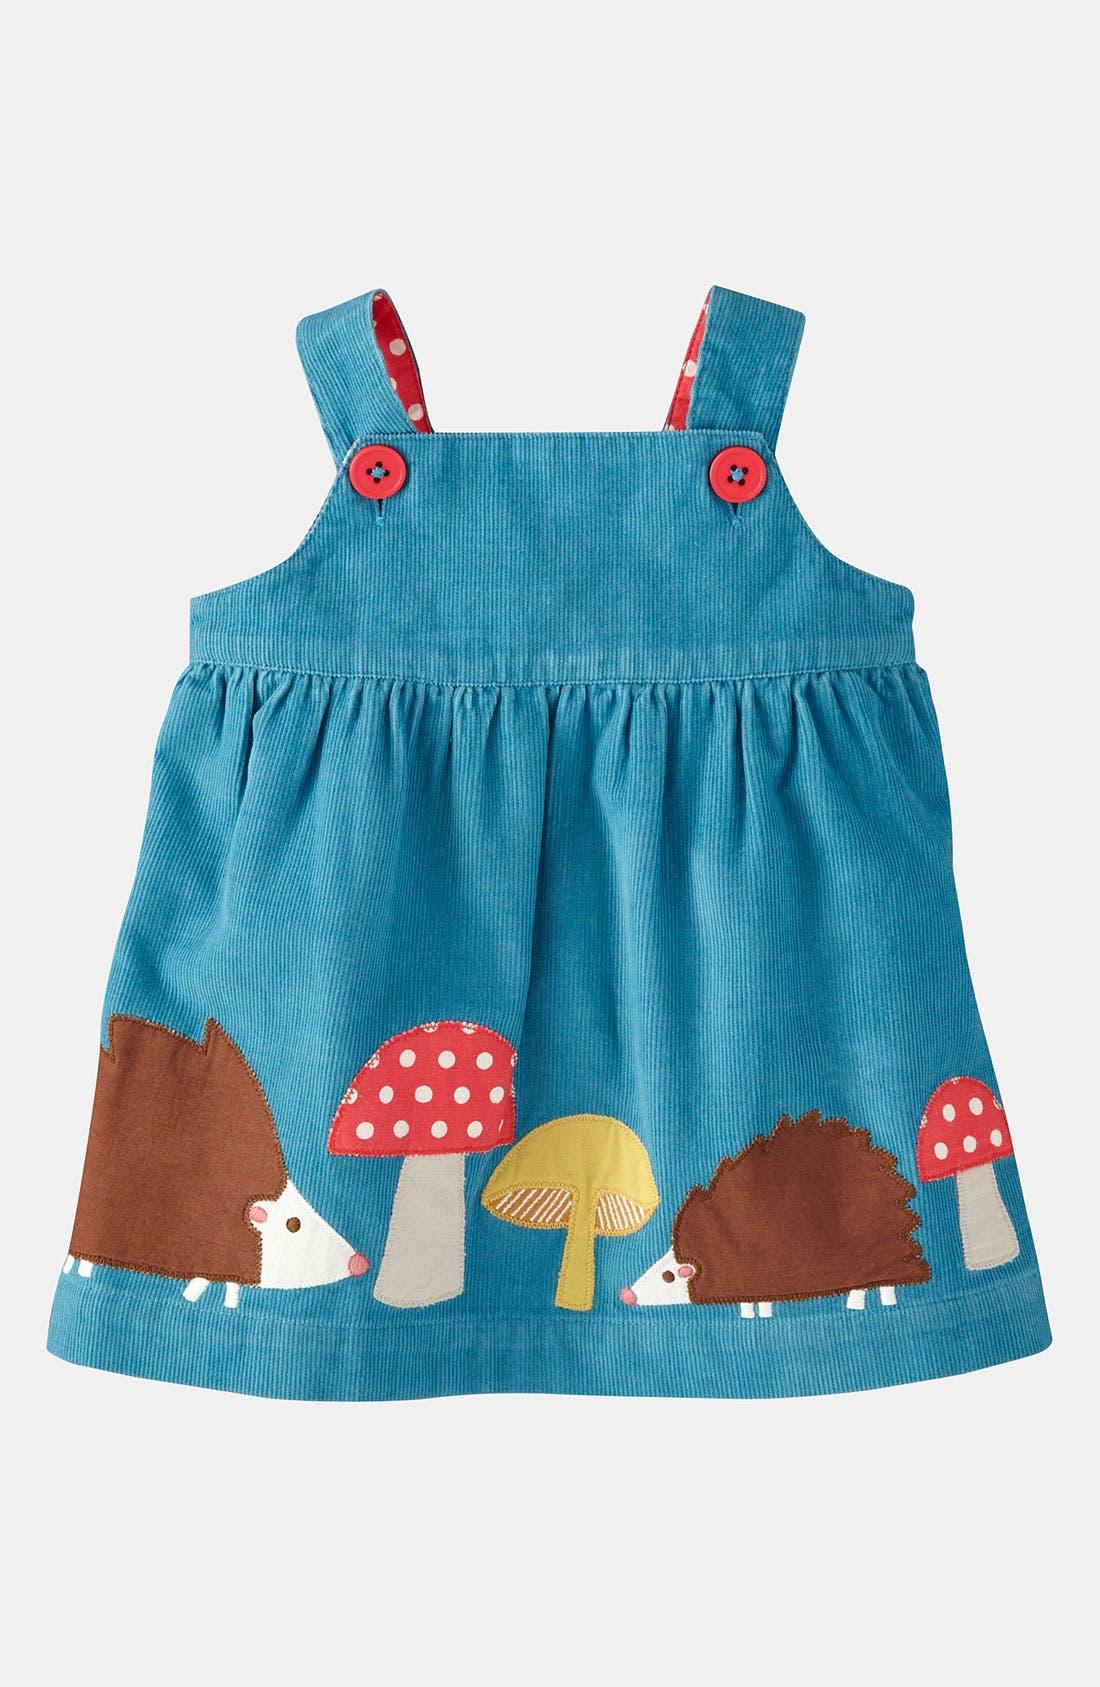 Alternate Image 1 Selected - Mini Boden Appliqué Dress (Infant)